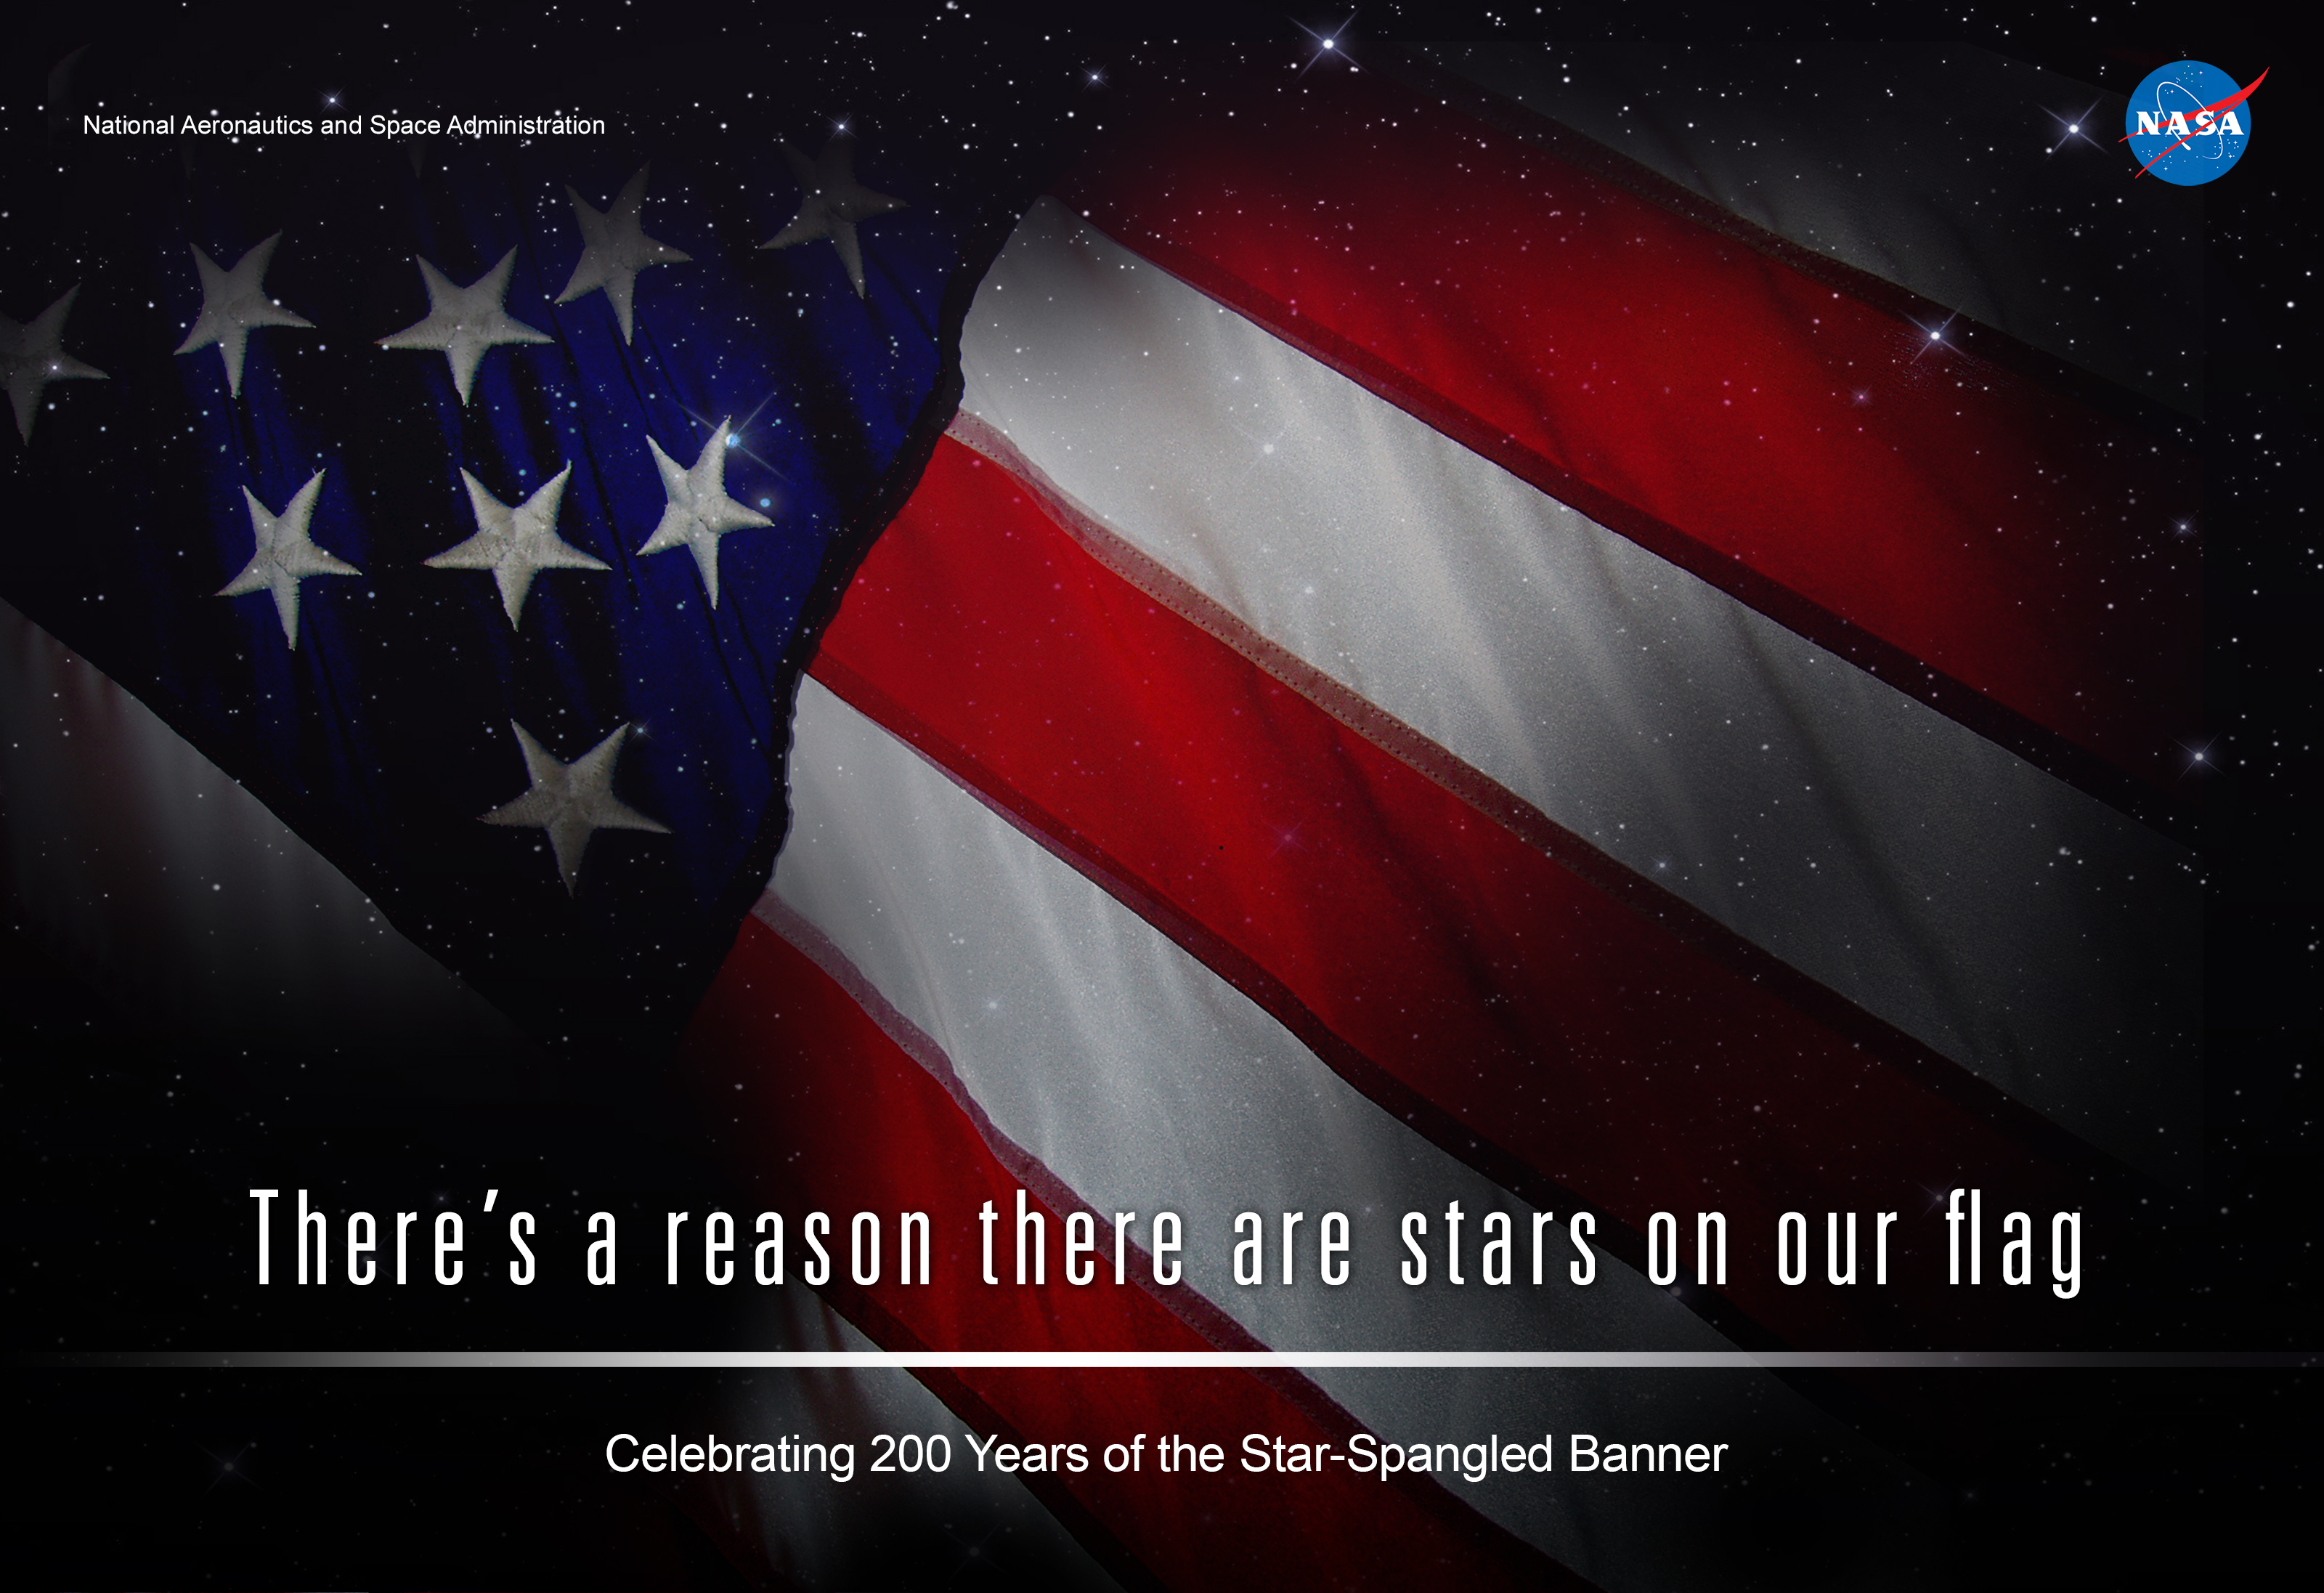 nasa space flag - photo #38